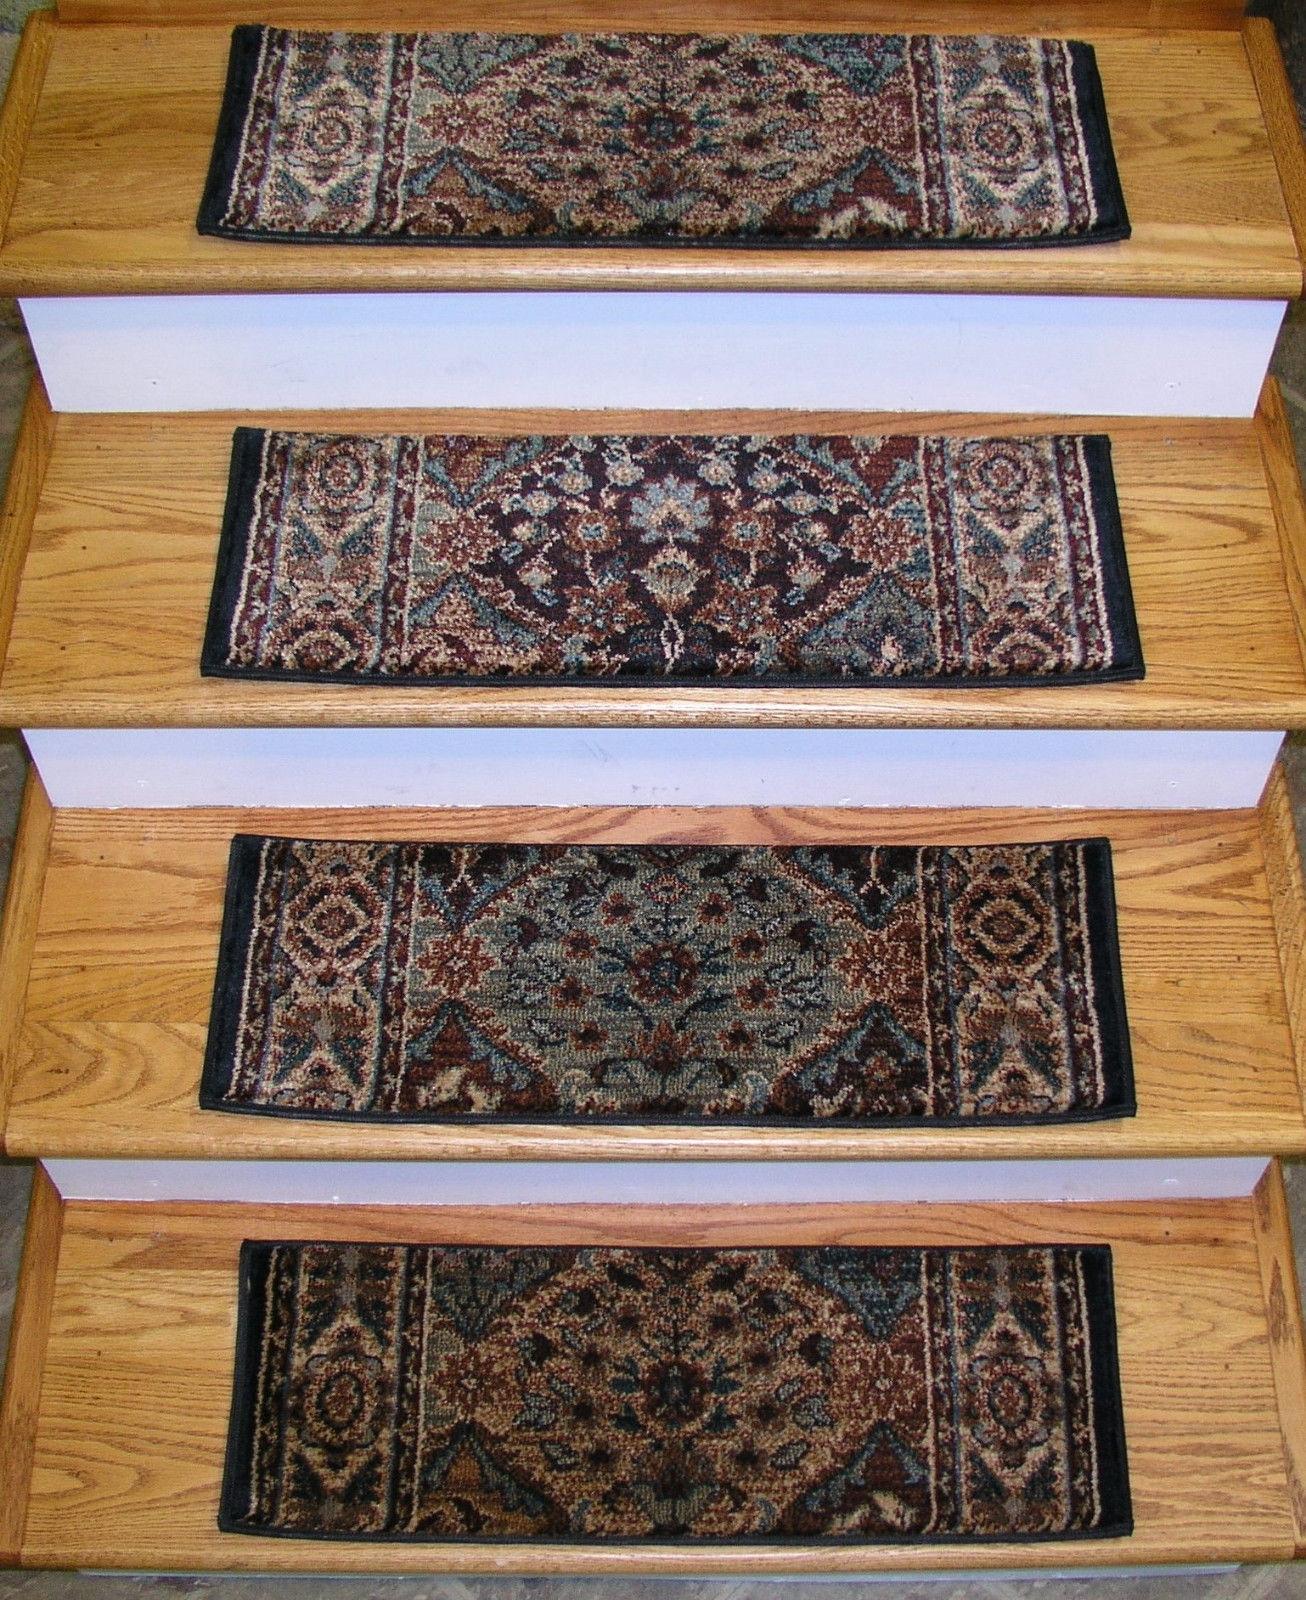 152938 Rug Depot Premium Carpet Stair Treads Set Of 13 Treads Throughout Premium Carpet Stair Treads (#1 of 20)